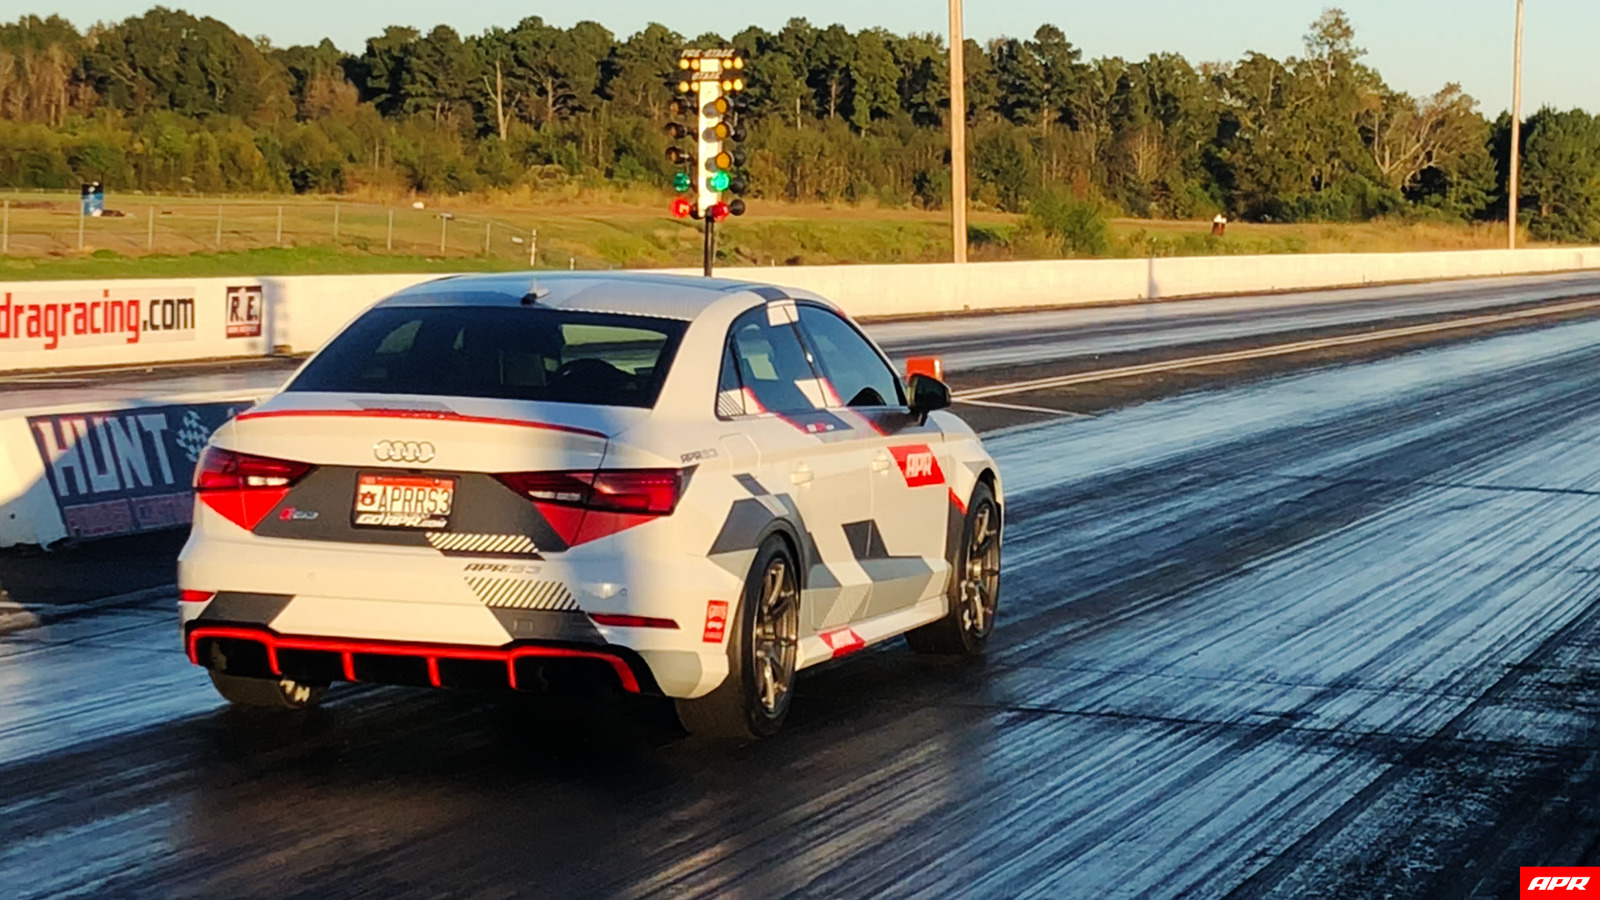 2018 White Audi Rs 3 Rs3 8v Sedan Pictures Mods Upgrades Wallpaper Dragtimes Com